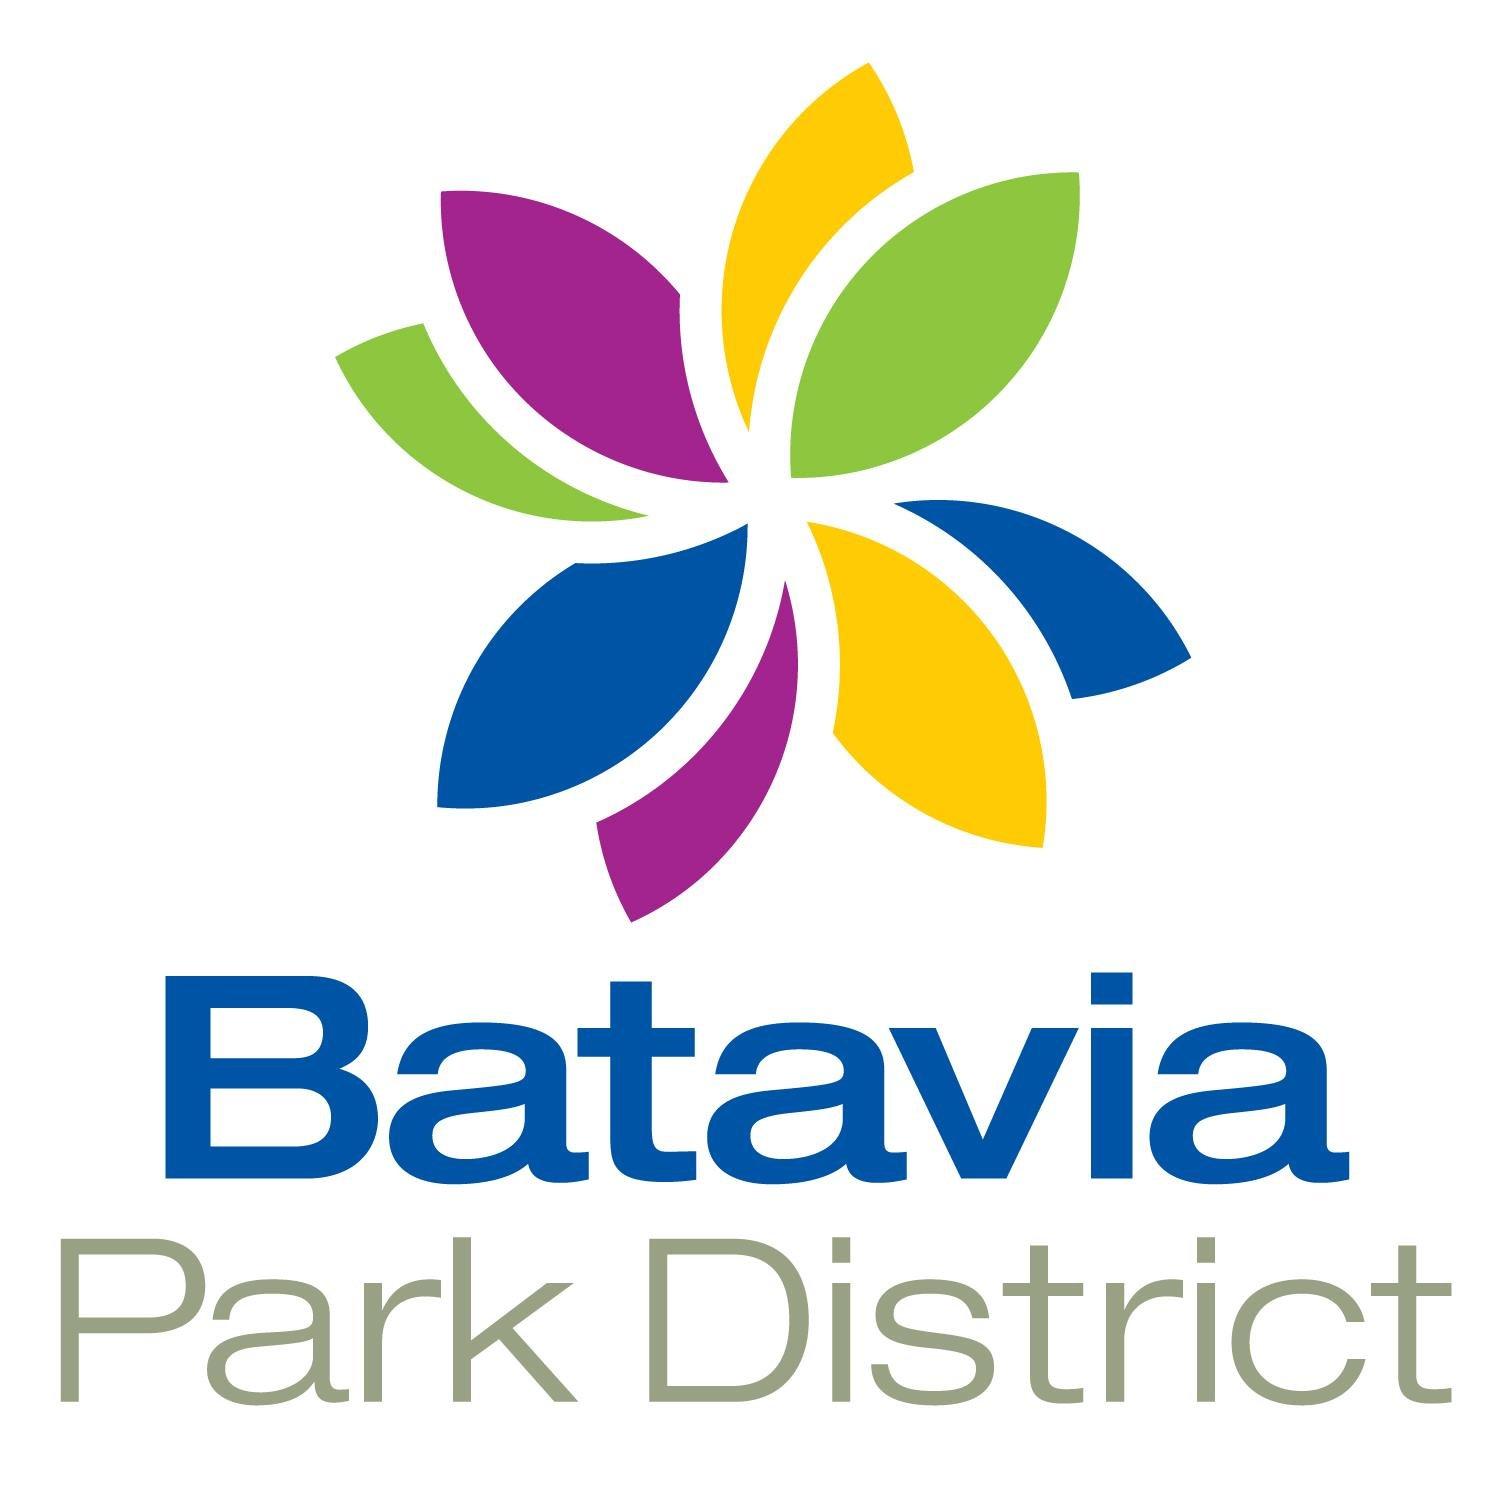 BataviaParkDistrict